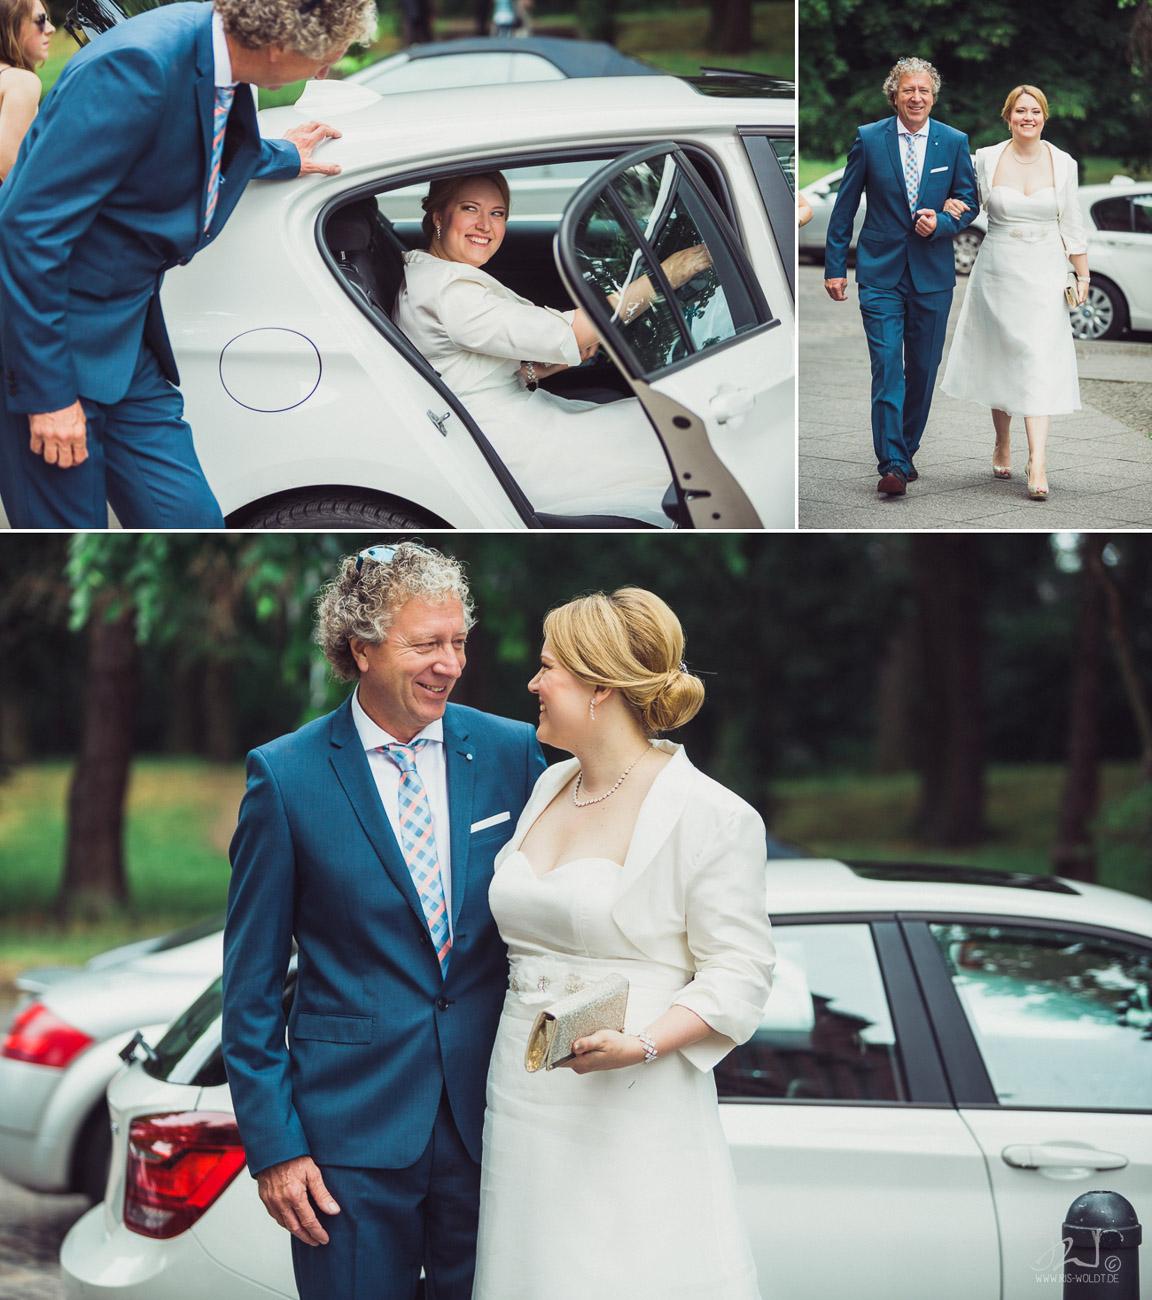 0017_Hochzeitsfotograf_Potsdam_Gut_Schloss_Golm_IrisWoldt18